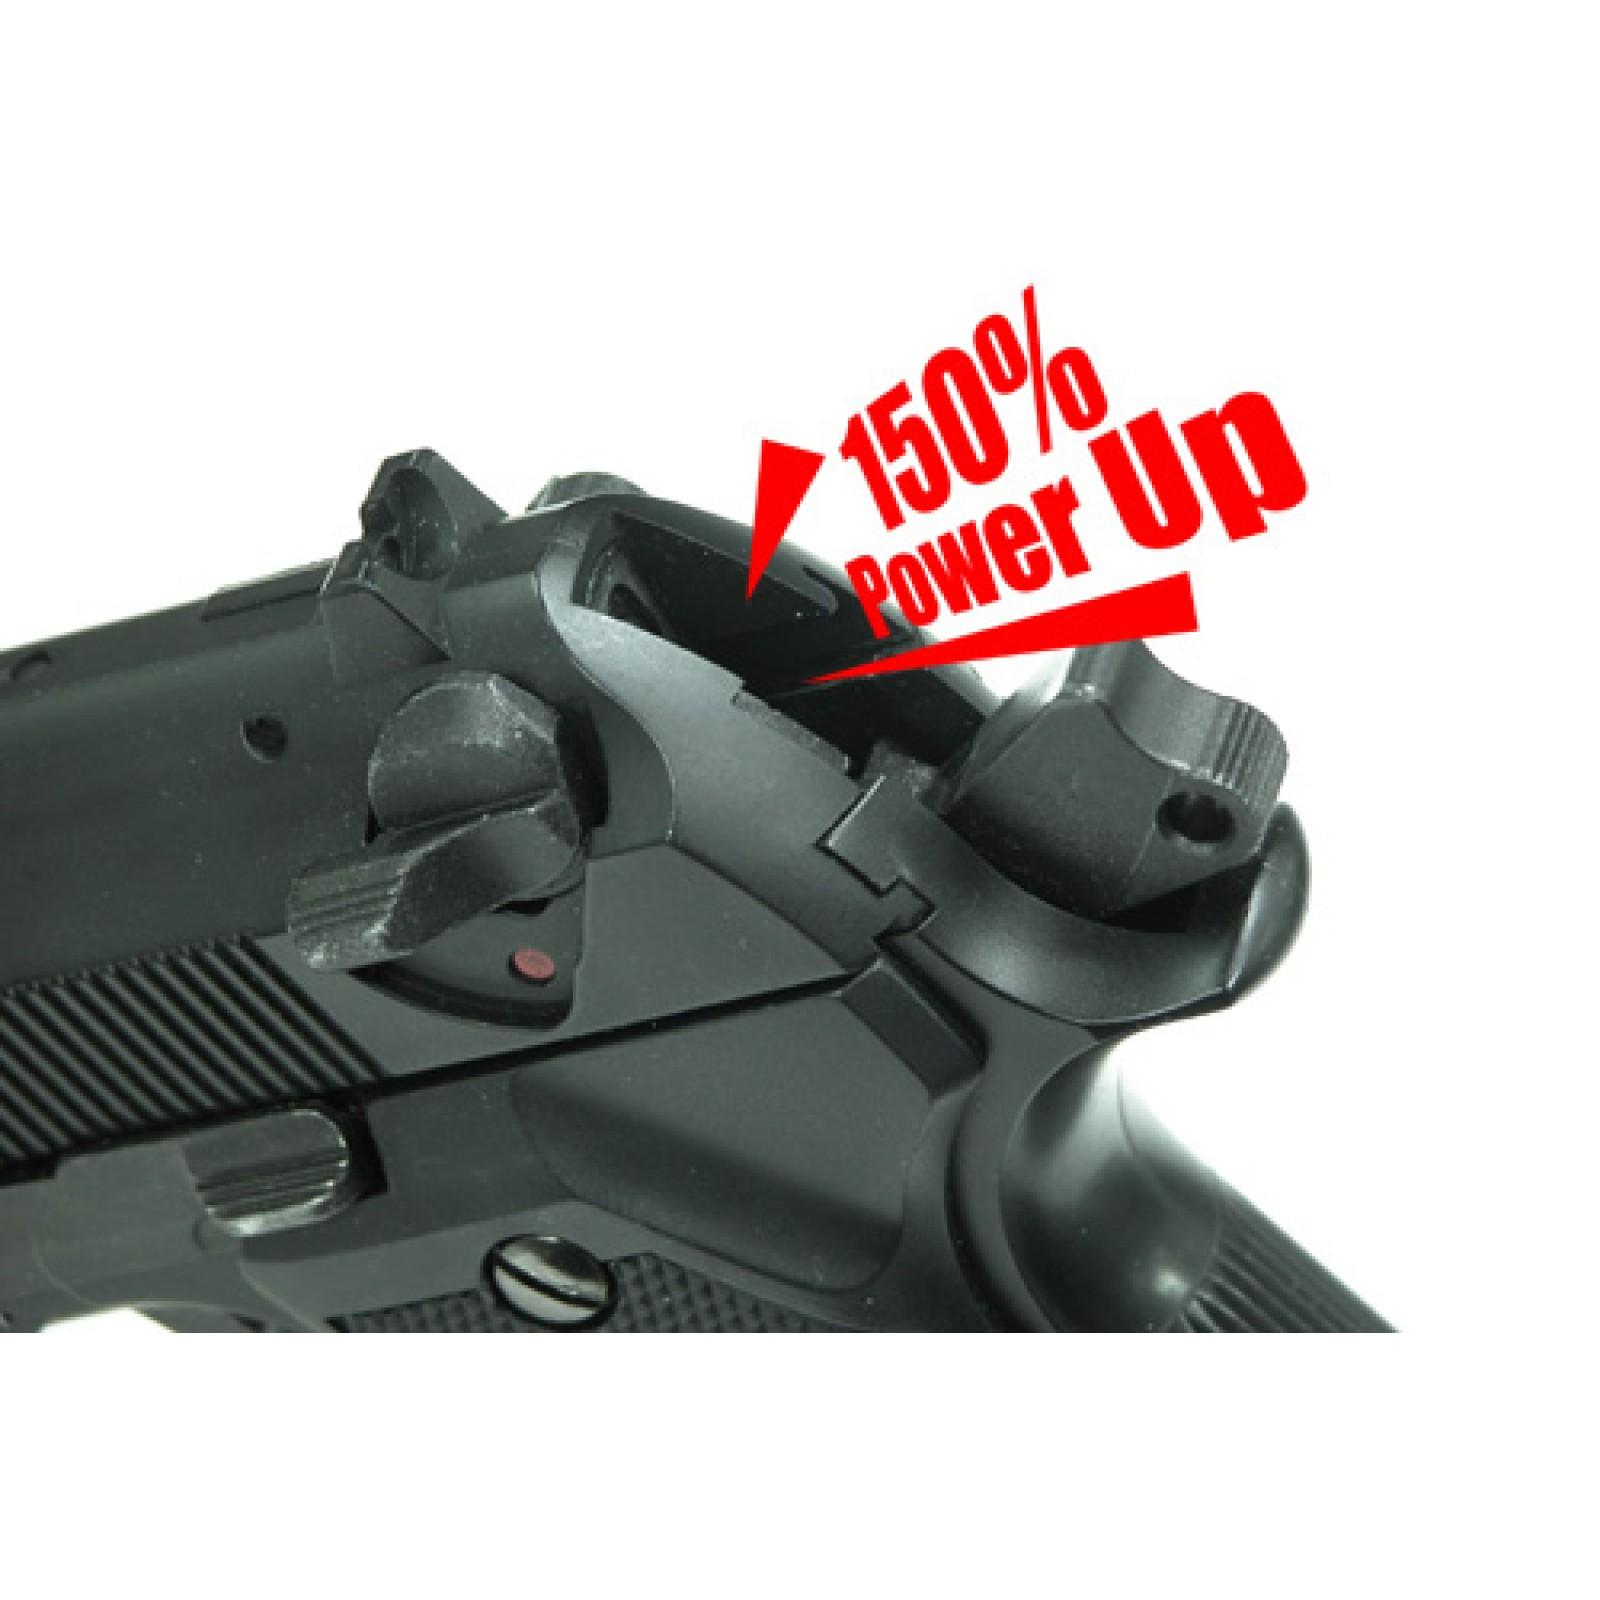 Guarder Enhanced Recoil//Hammer Spring for MARUI//KJ//WE P226 150/%